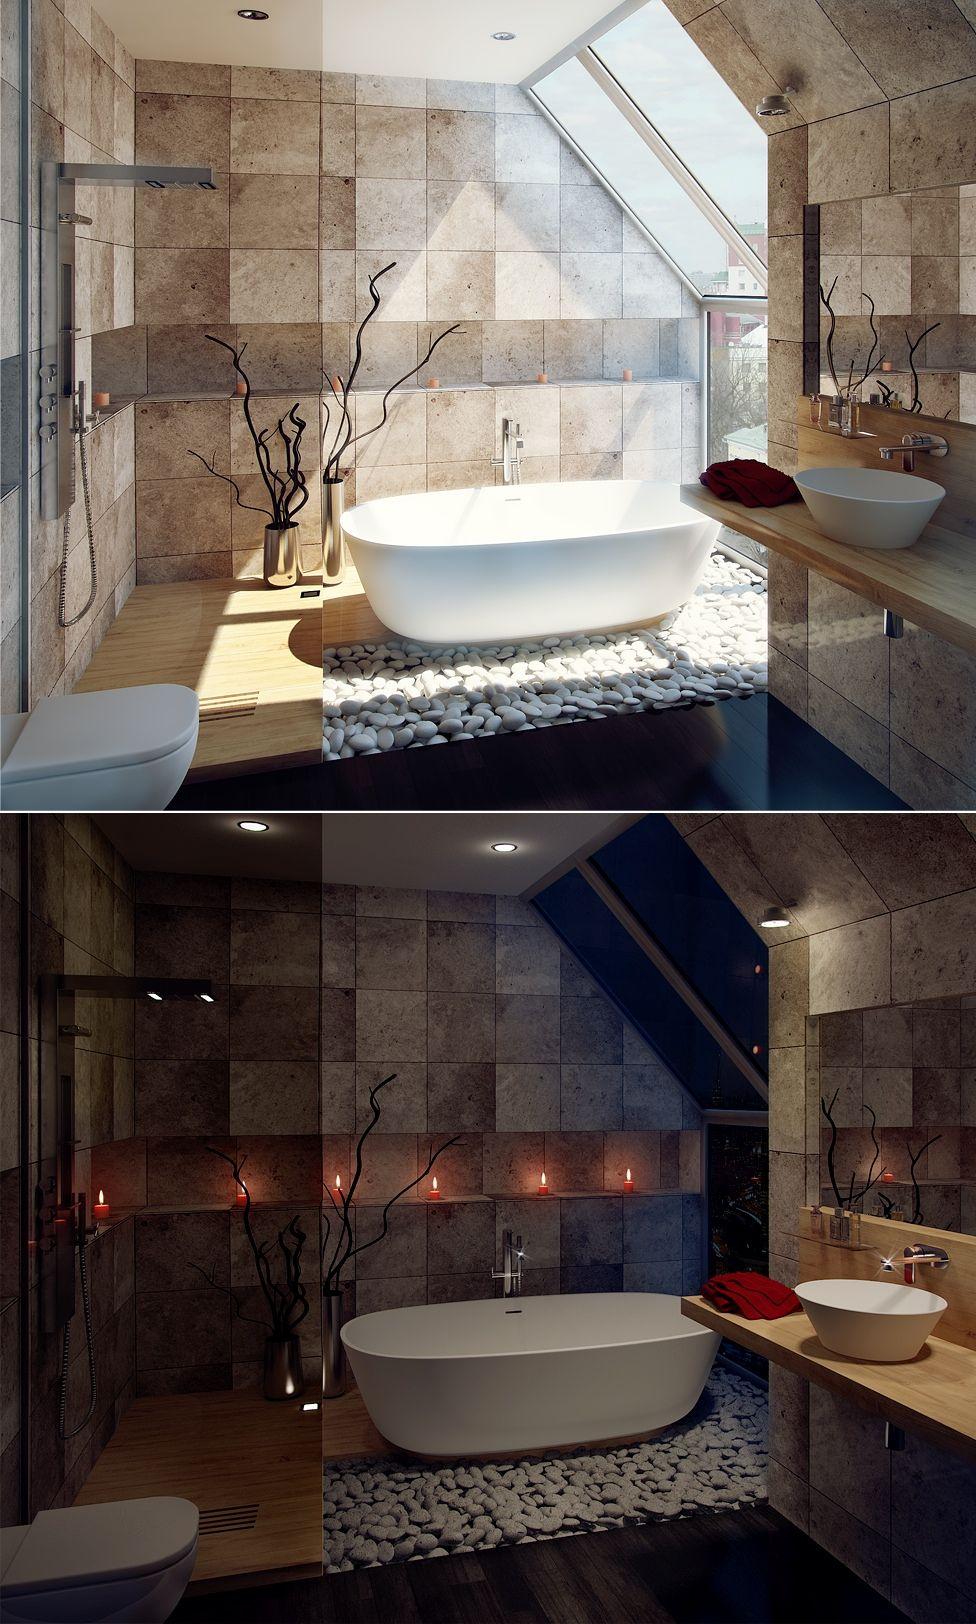 View Bathroom Designs Mesmerizing Contemporary Bathroom Design Ideas Complete With Perfect Bathtubs Design Ideas